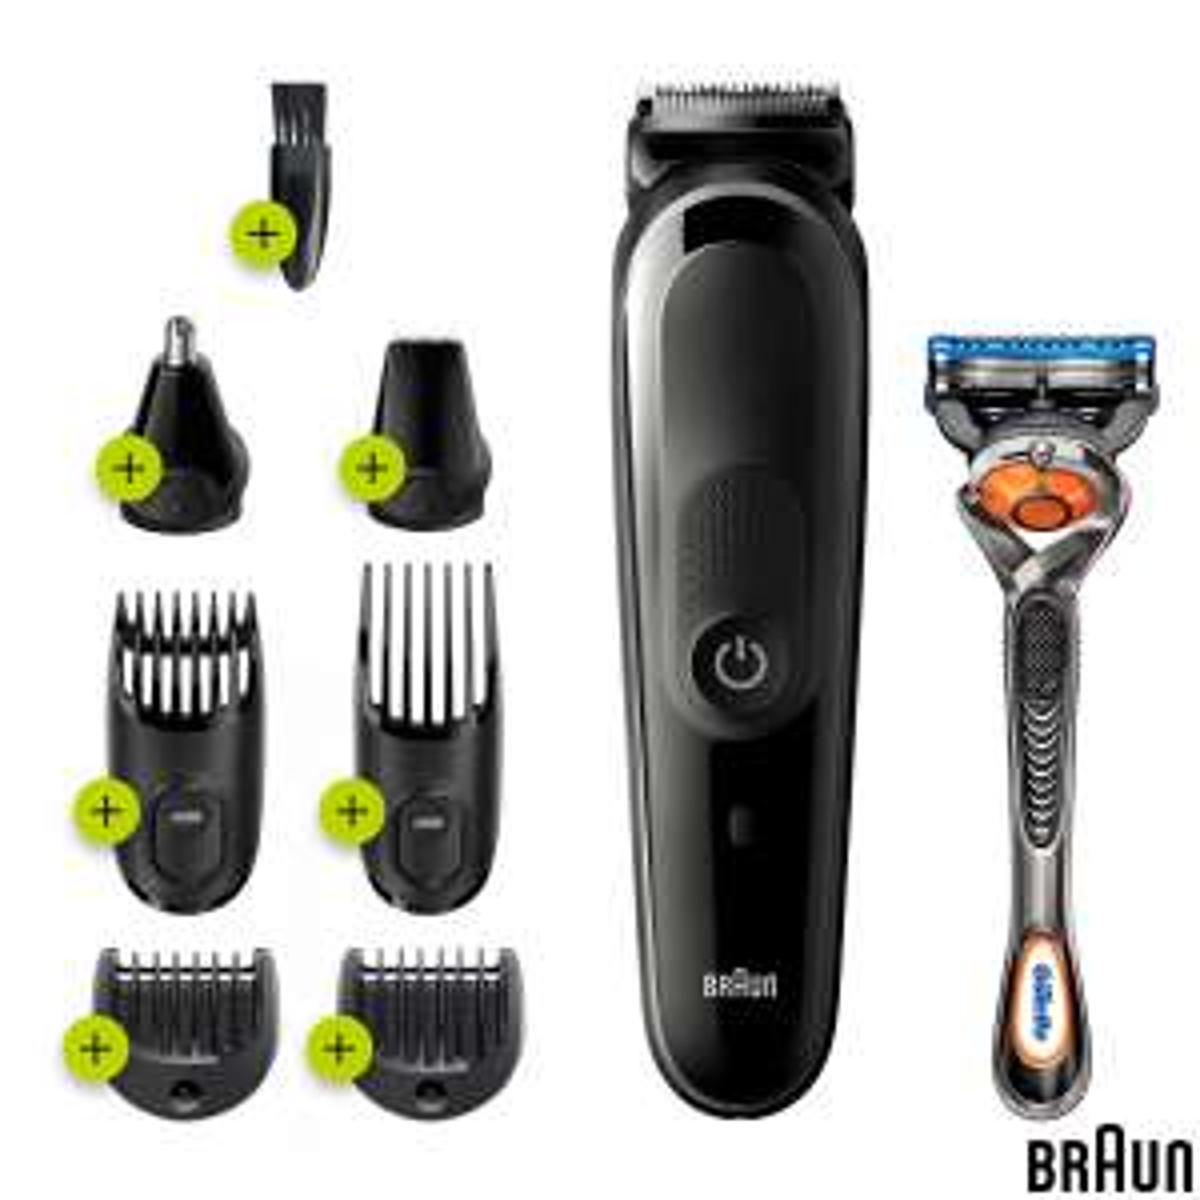 Braun 8-in-1 Beard & Face Trimmer + Hair Clipper + Gillette Fusion 5 ProGlide Razor MGK5260 £29.89 delivered (Membership Required) @ Costco